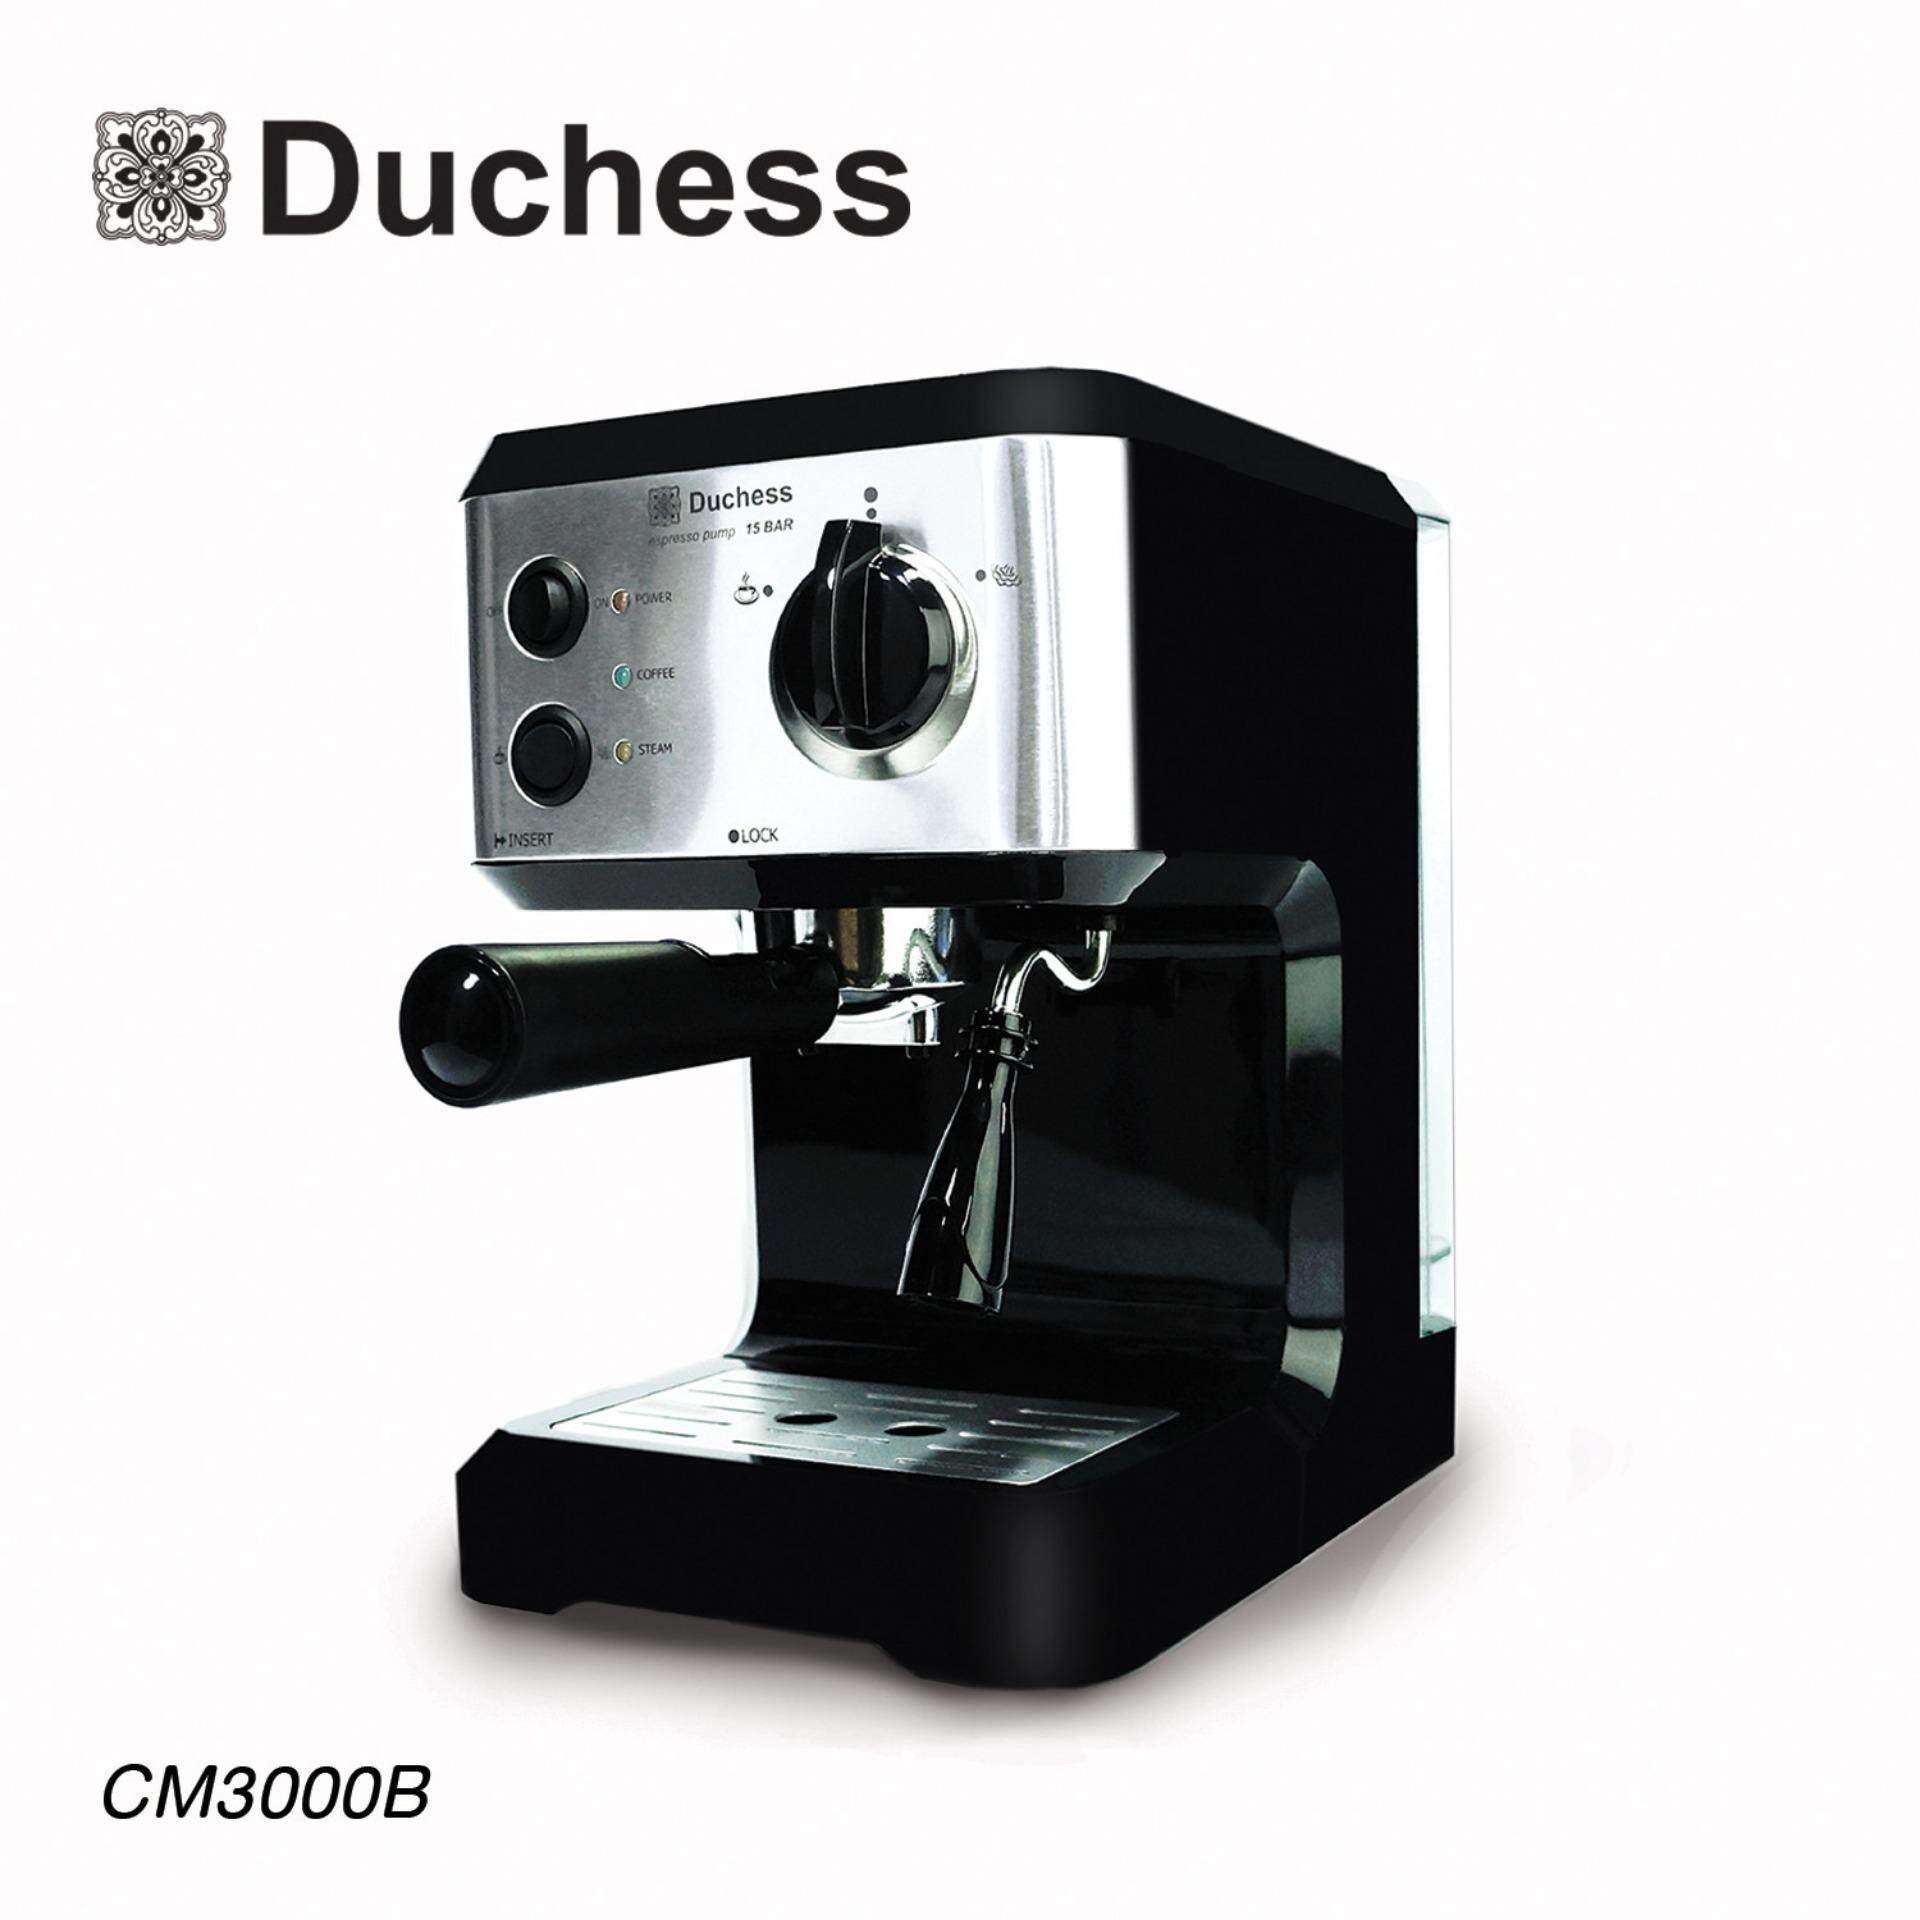 Duchess เครื่องชงกาแฟสด รุ่น CM3000B  - 4d308c798b8897085819cb90ded4f640 - วิธีตั้งระดับน้ำ เครื่องชงกาแฟสดรุ่น Trusher-3200